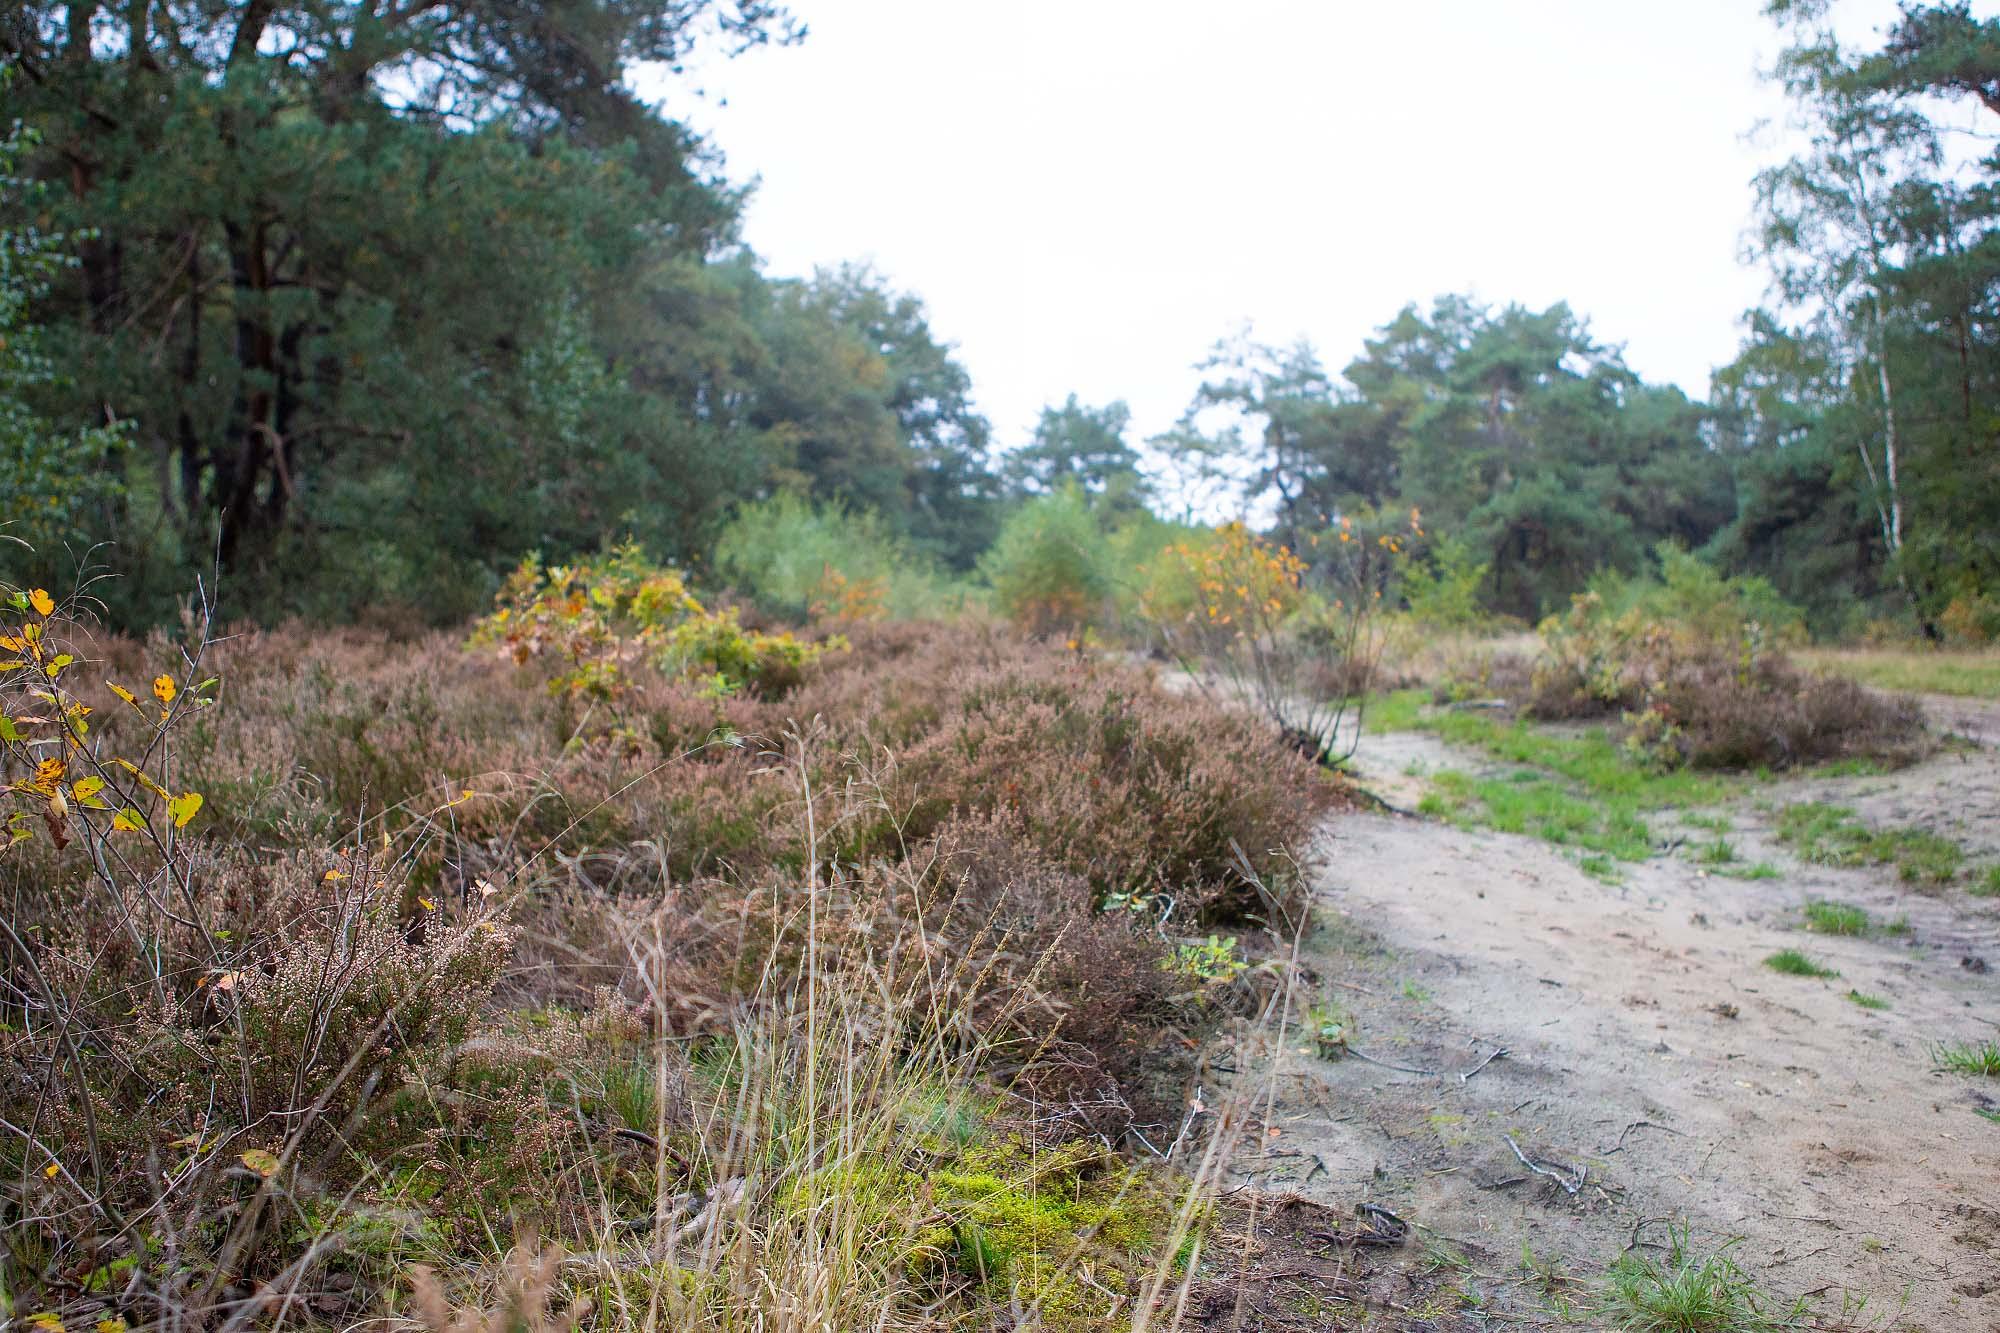 Dwingelderveld wandelroute Ruinen